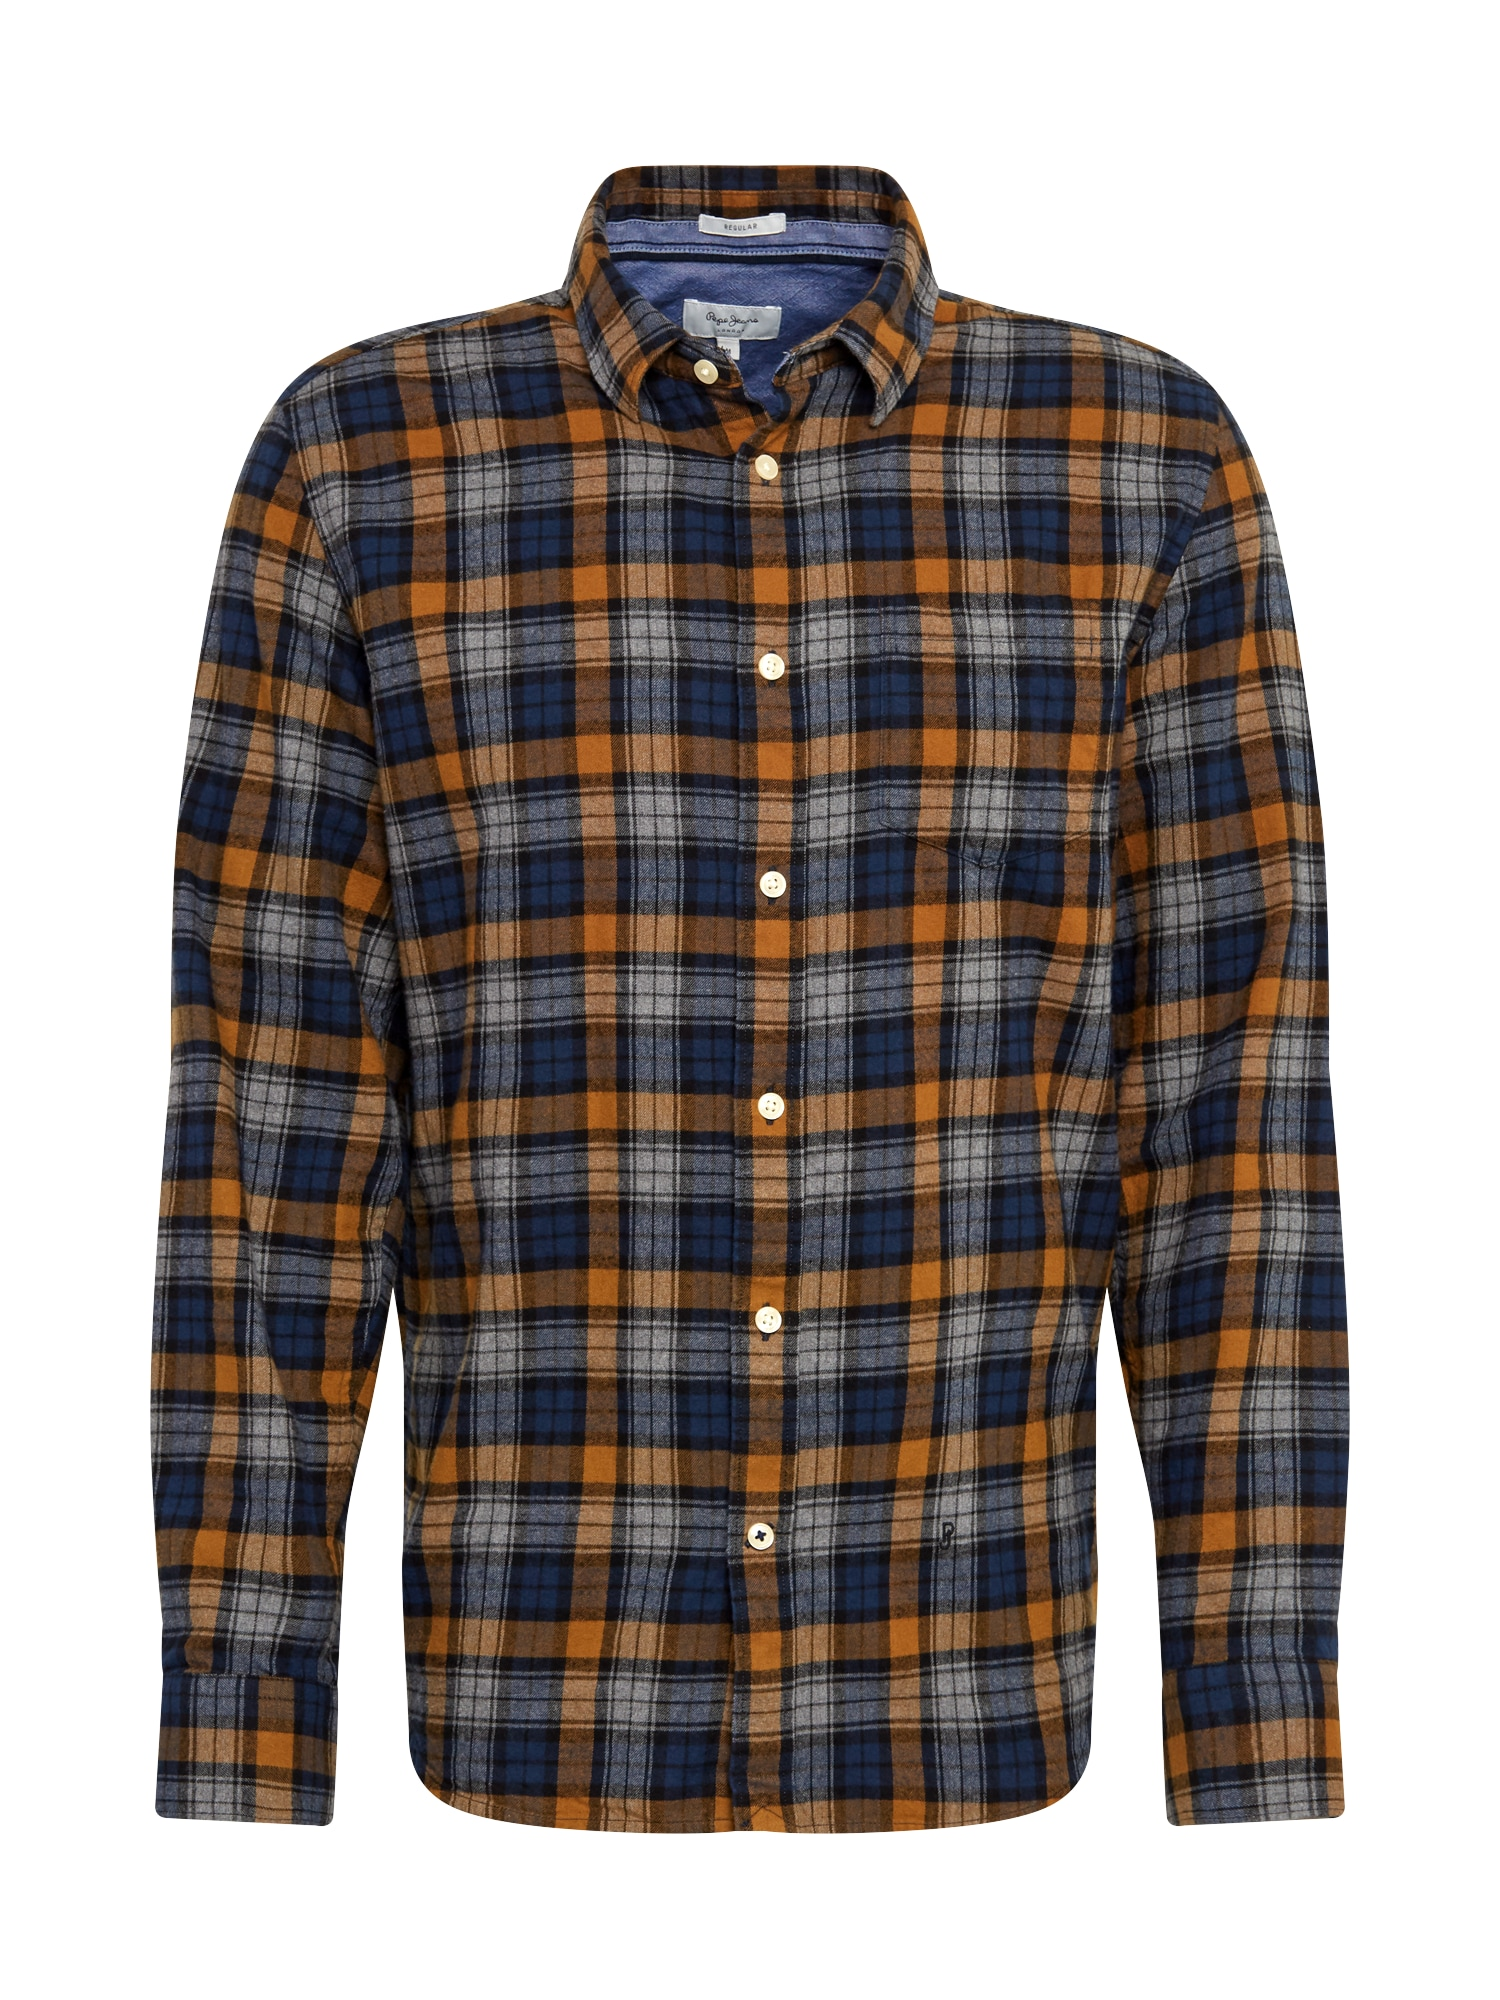 Pepe Jeans Košile 'Telford'  hnědá / modrá